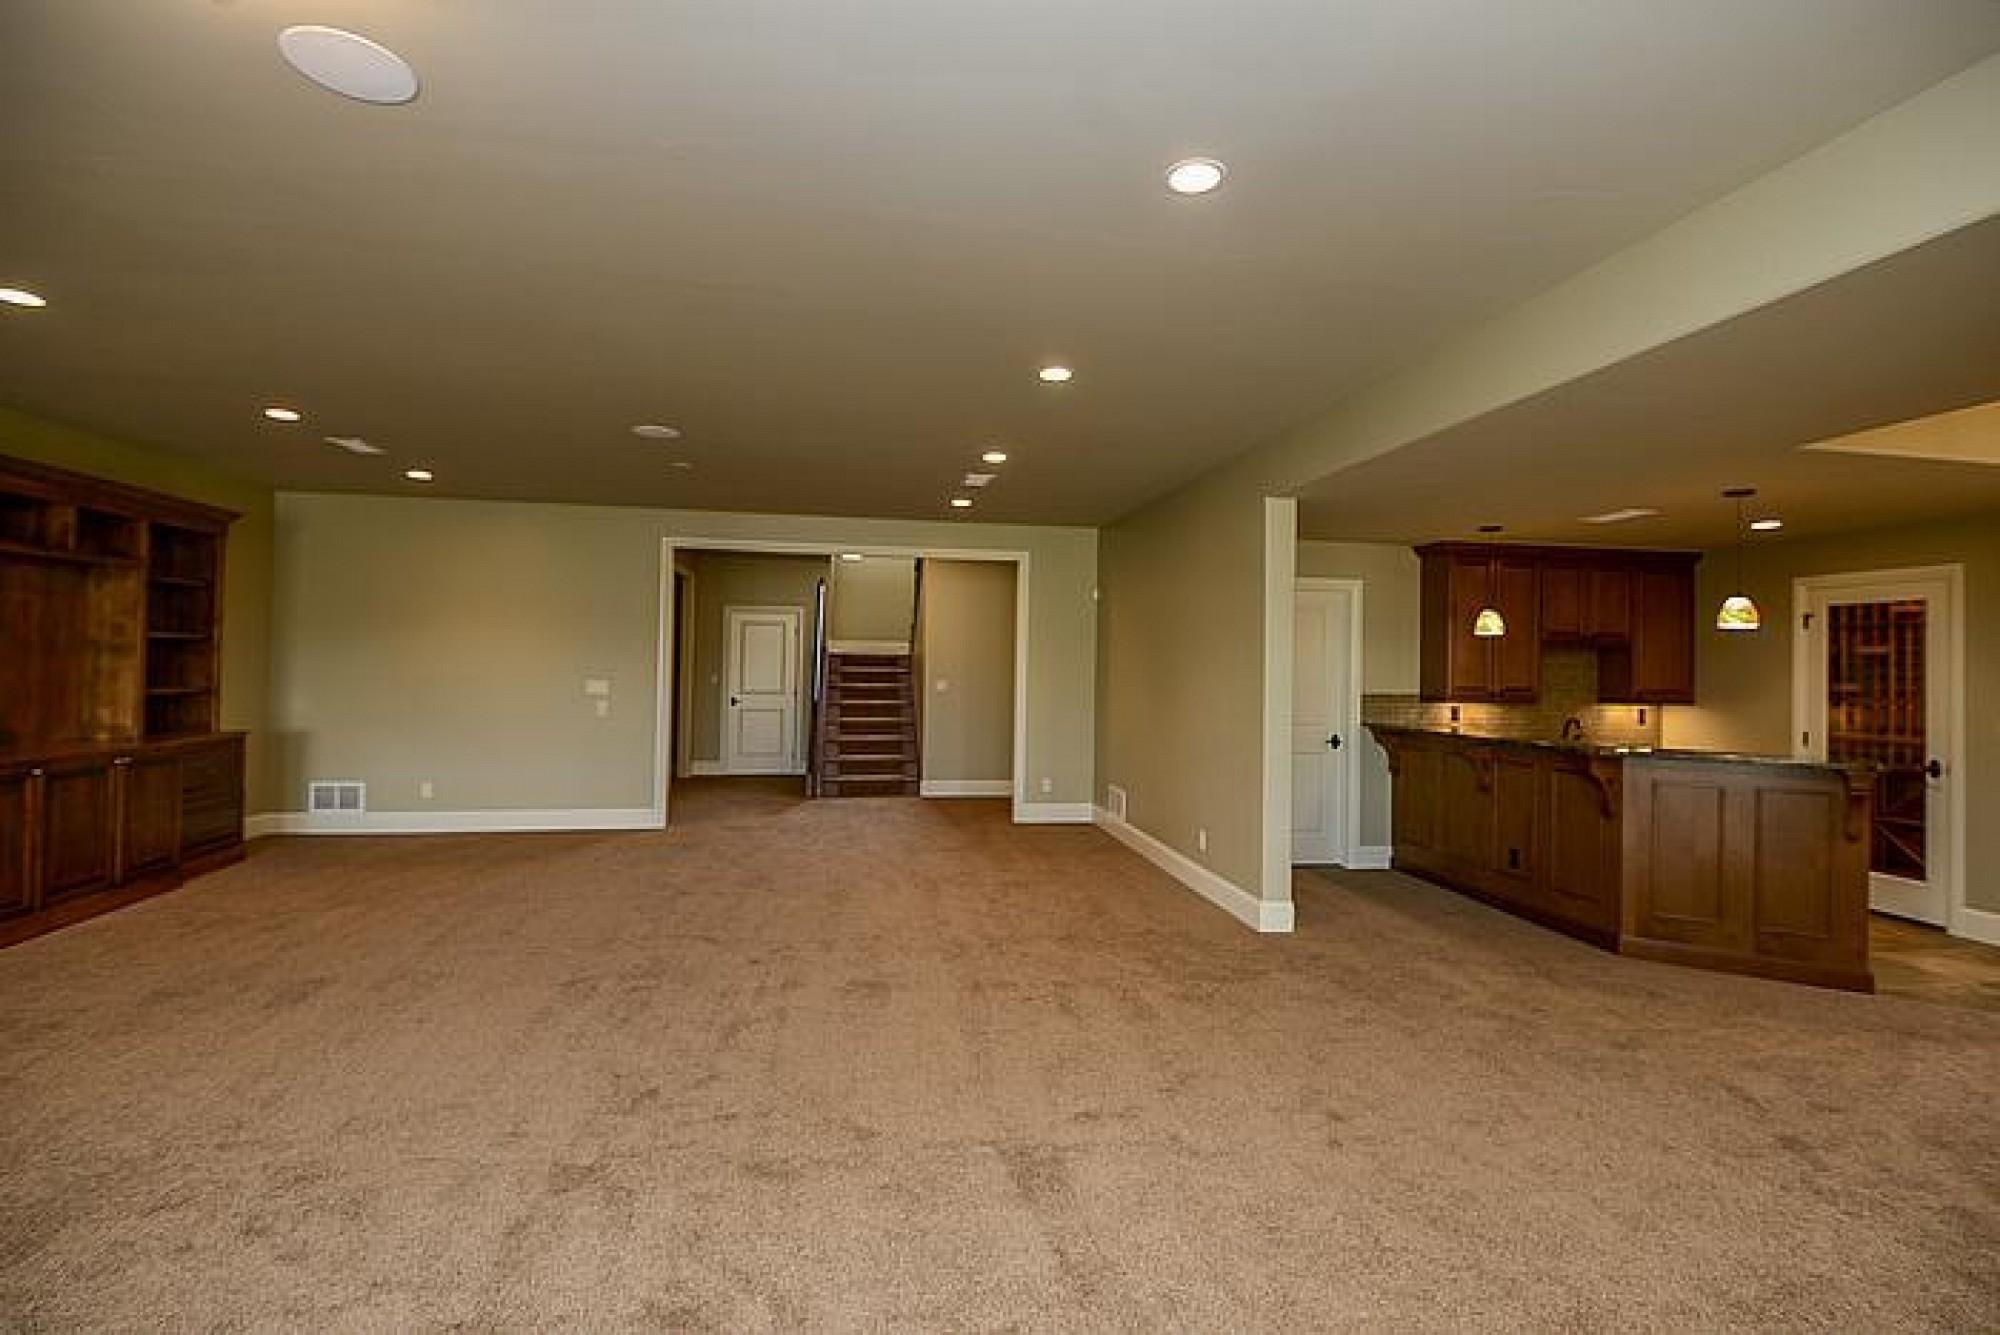 8990 E. Vassar Avenue, Denver, CO 80231